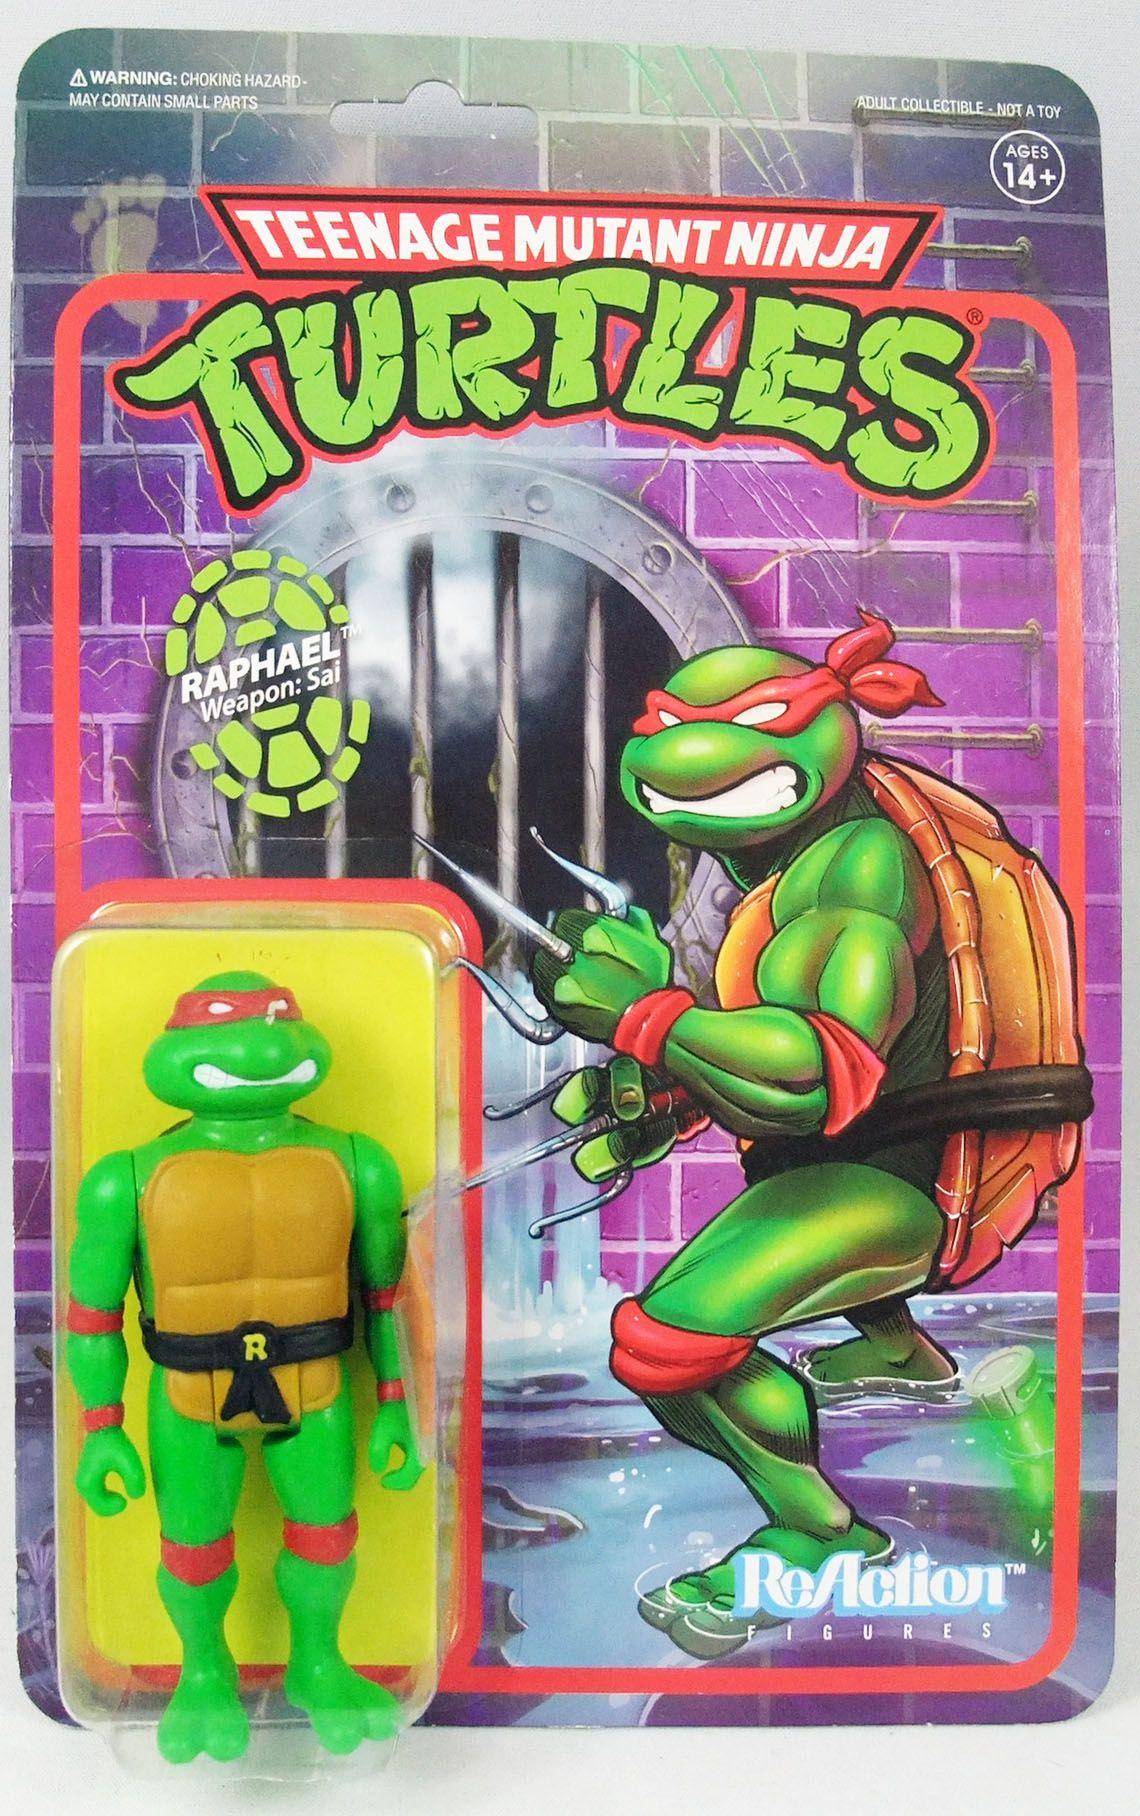 TMNT Tortues Ninja - Super7 ReAction Figures - Raphael